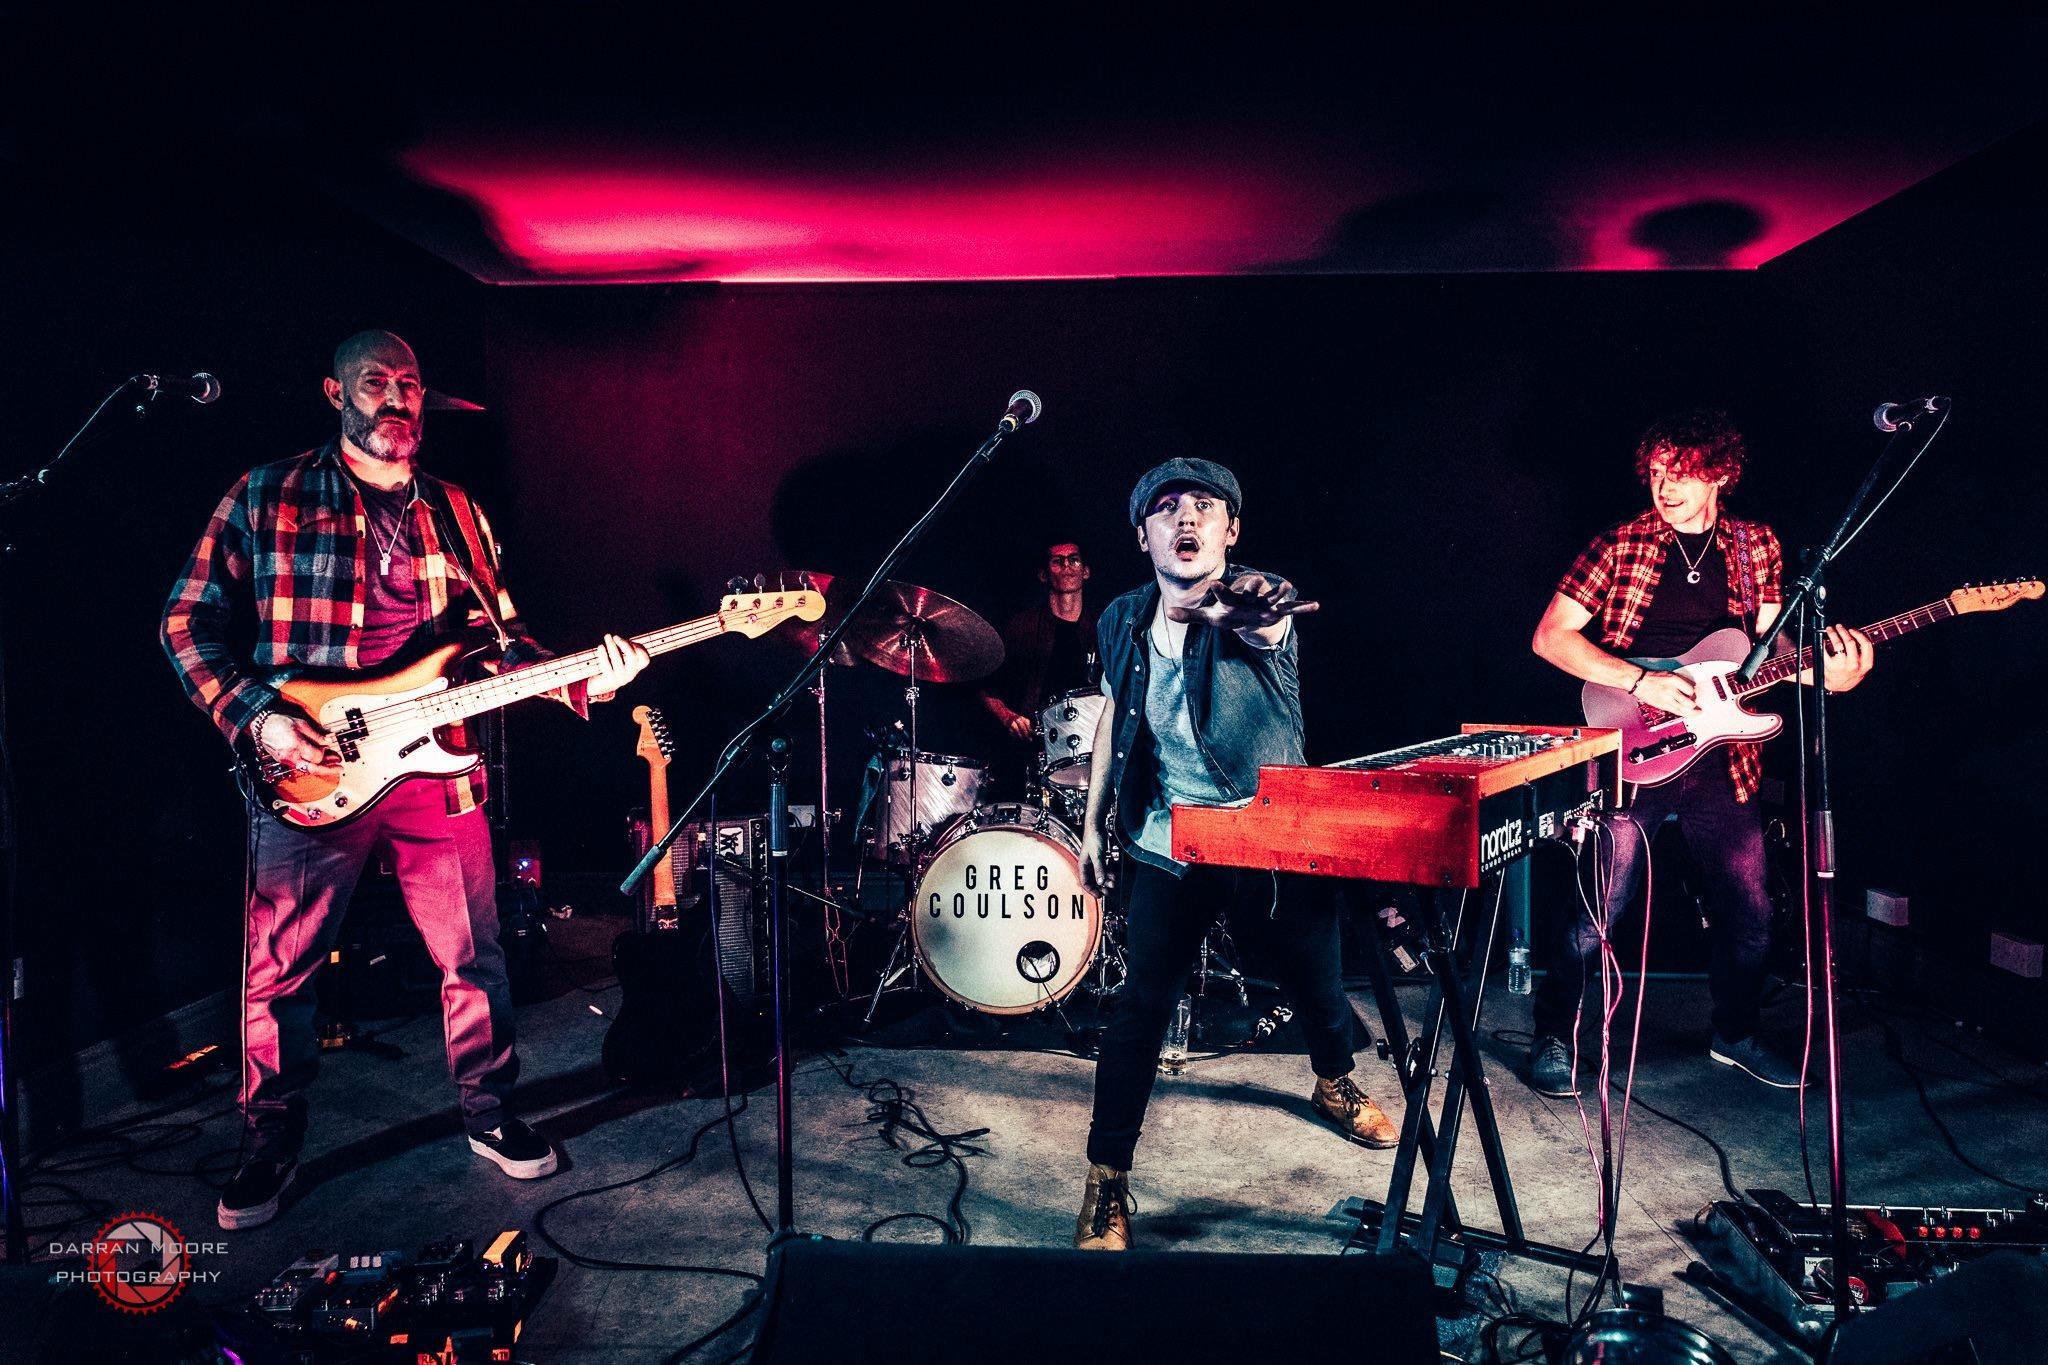 GREG COULSON BIG BAND - RHYTHM & BLUESDOOR 7PM / MUSIC 8.30PM£15 / £7.50 (BK)ADVANCE TICKETS HERE